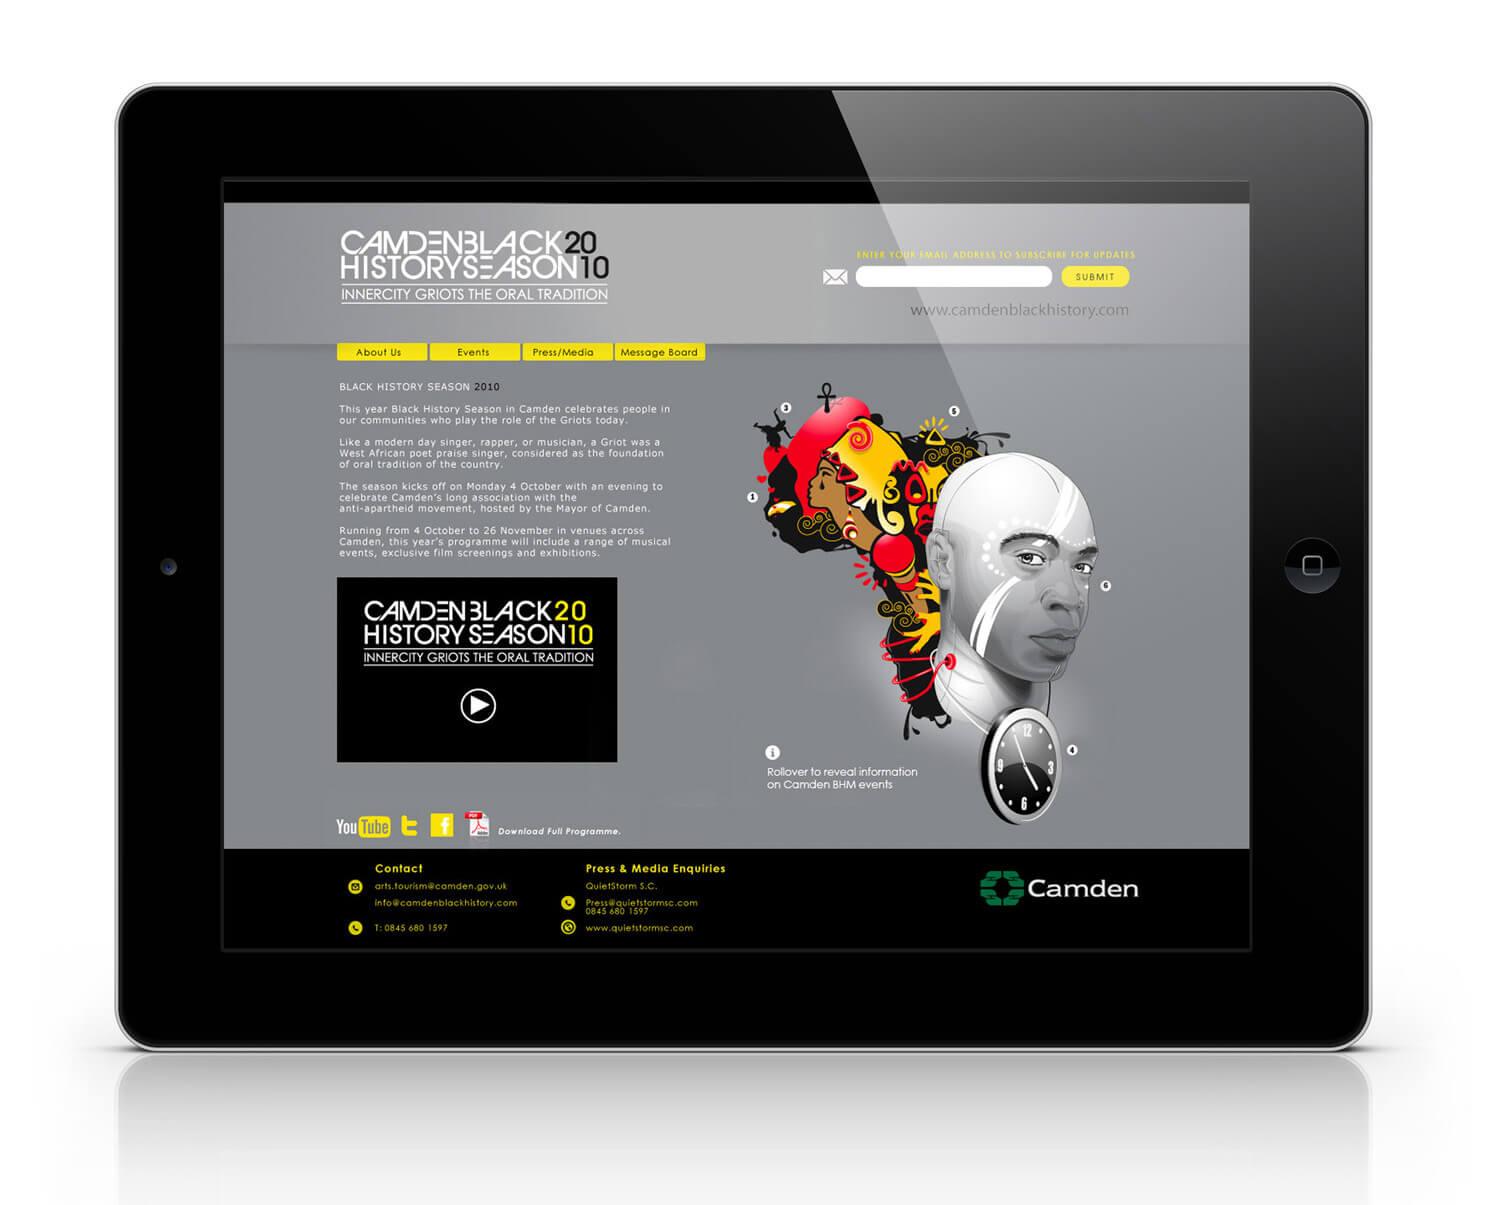 BHM_iPad-Landscape-Retina-Display-Mockup3